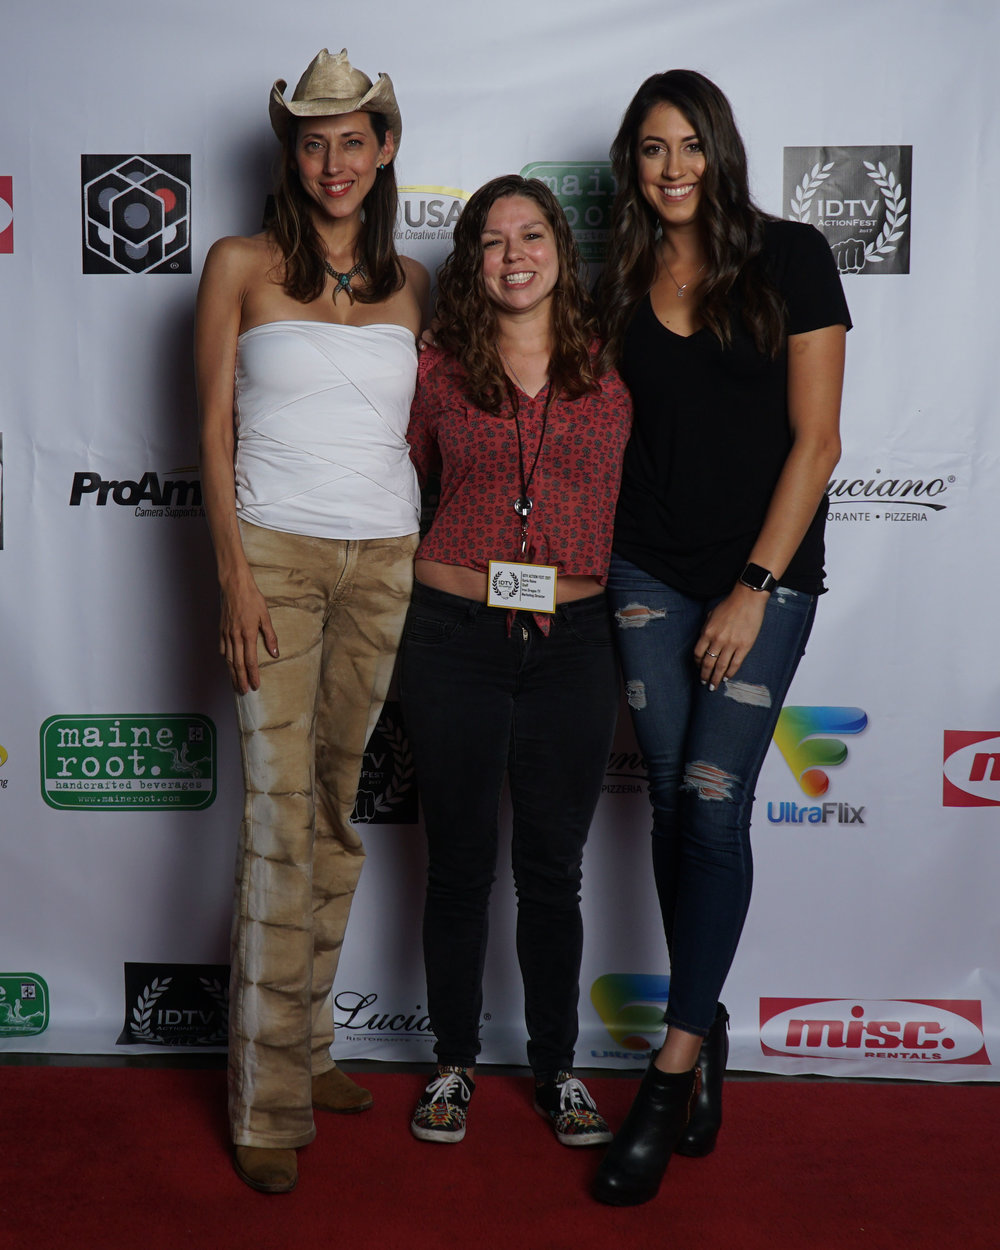 Patricia Vonne, Karla Reina, and Caitlin Dechelle